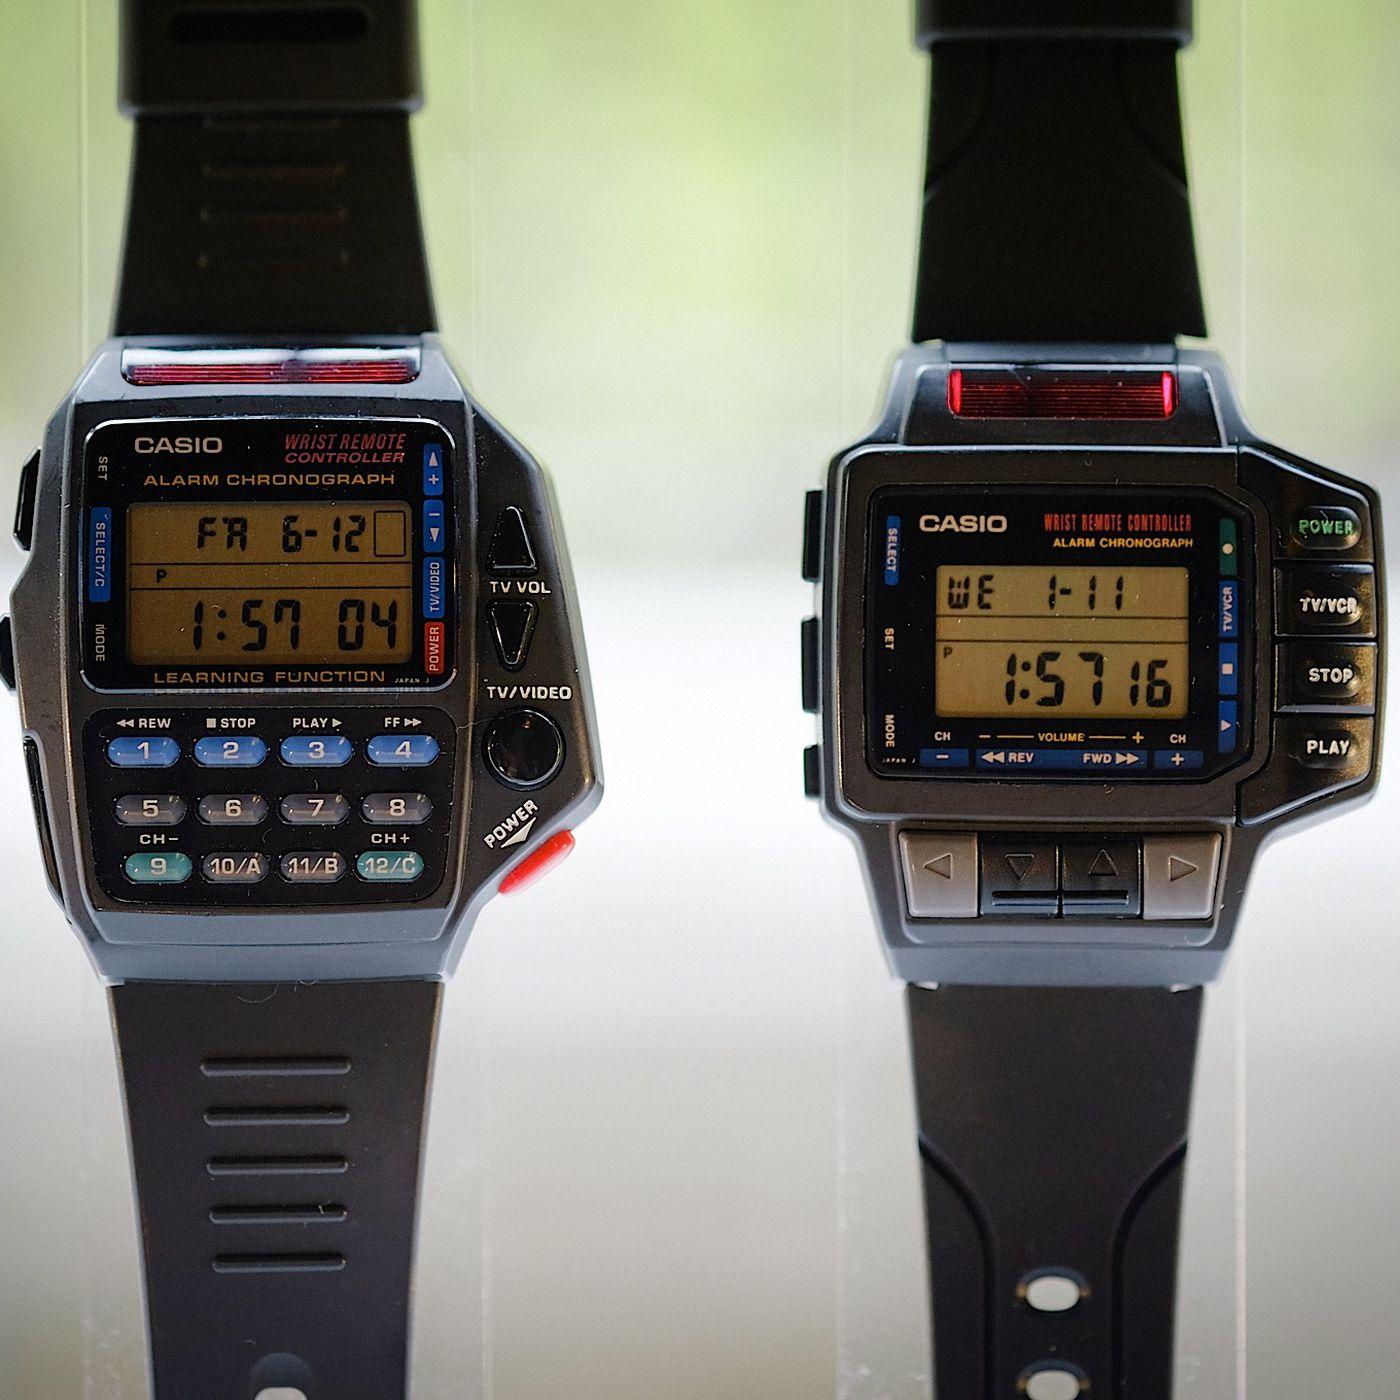 32341fa90652 The original smartwatches  Casio s history of wild wrist designs - The Verge